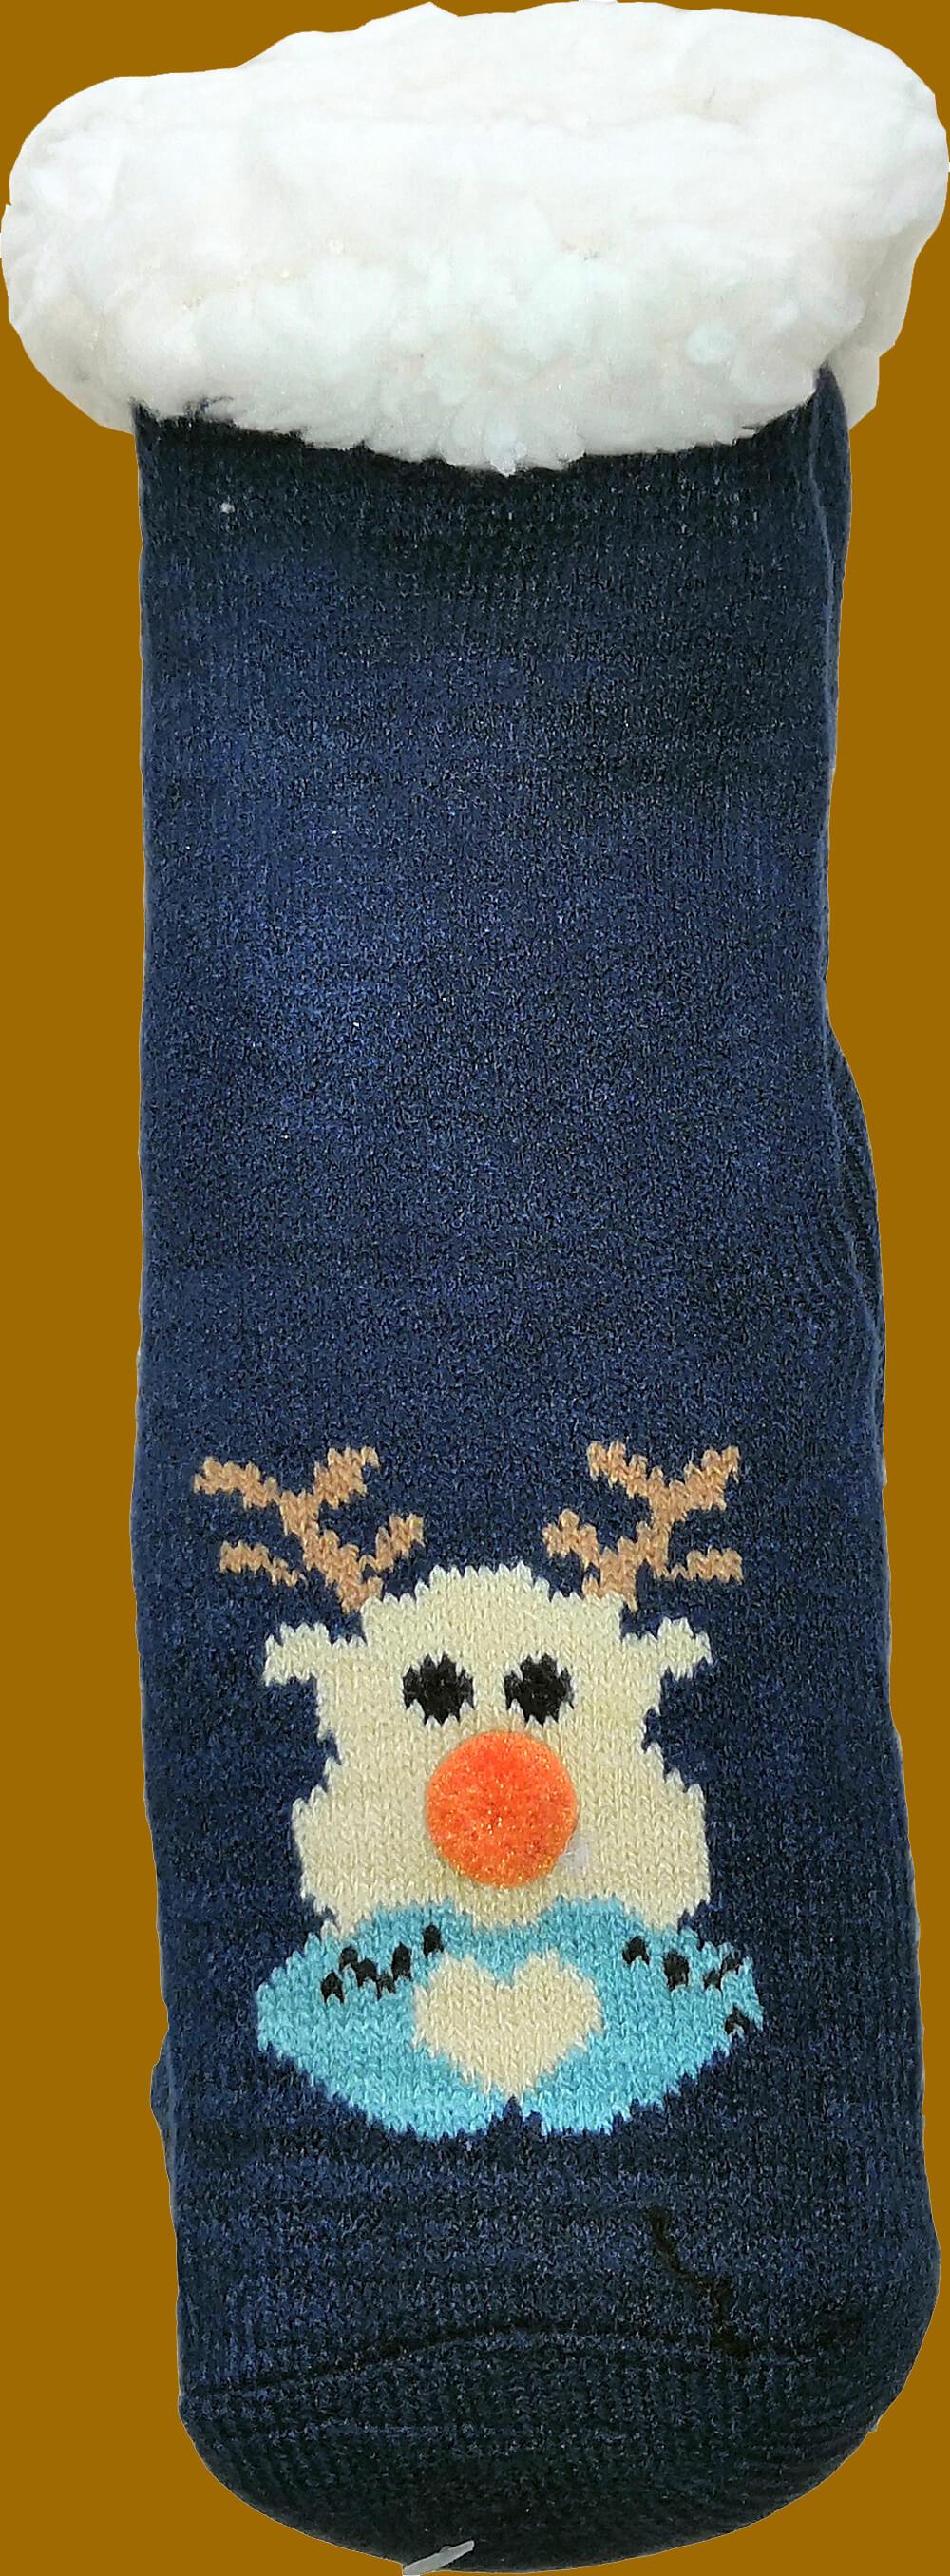 Детские носки-тапочки LookEN SM-HL-7211D-b 26-28 розміру синего цвета.